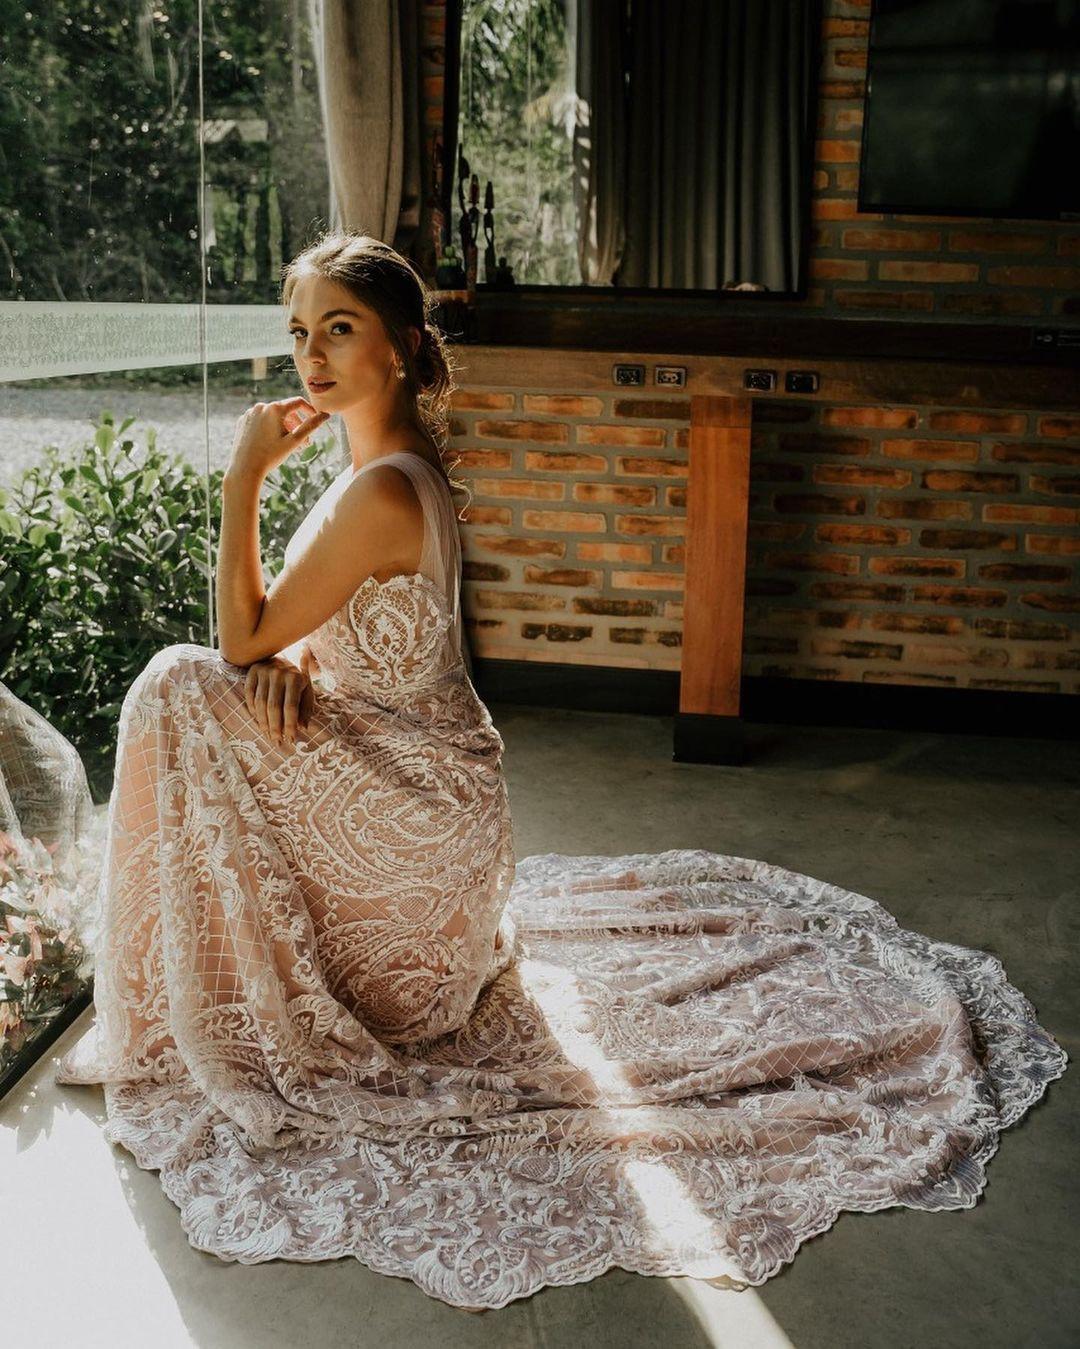 ana flavia giacomini, miss ilha dos lobos mundo 2019. - Página 2 Fvom4110